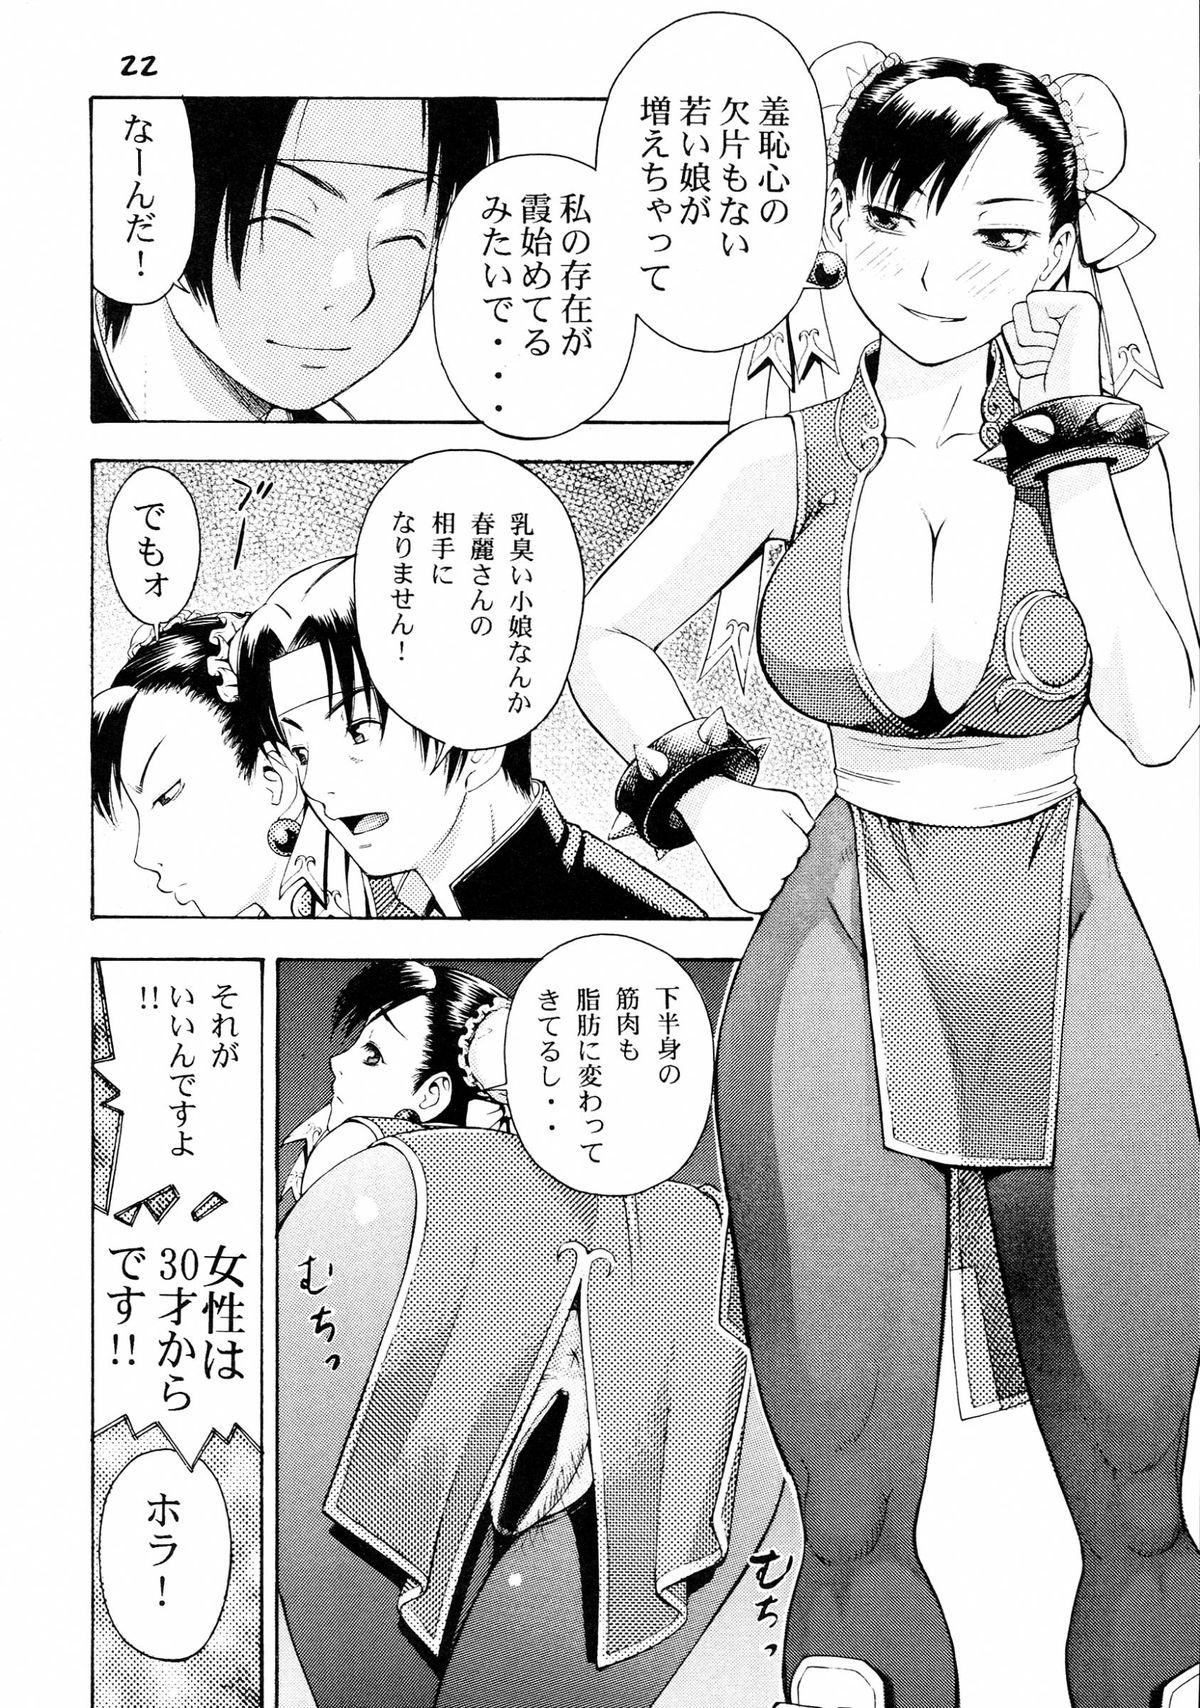 GIRL POWER vol.21 21